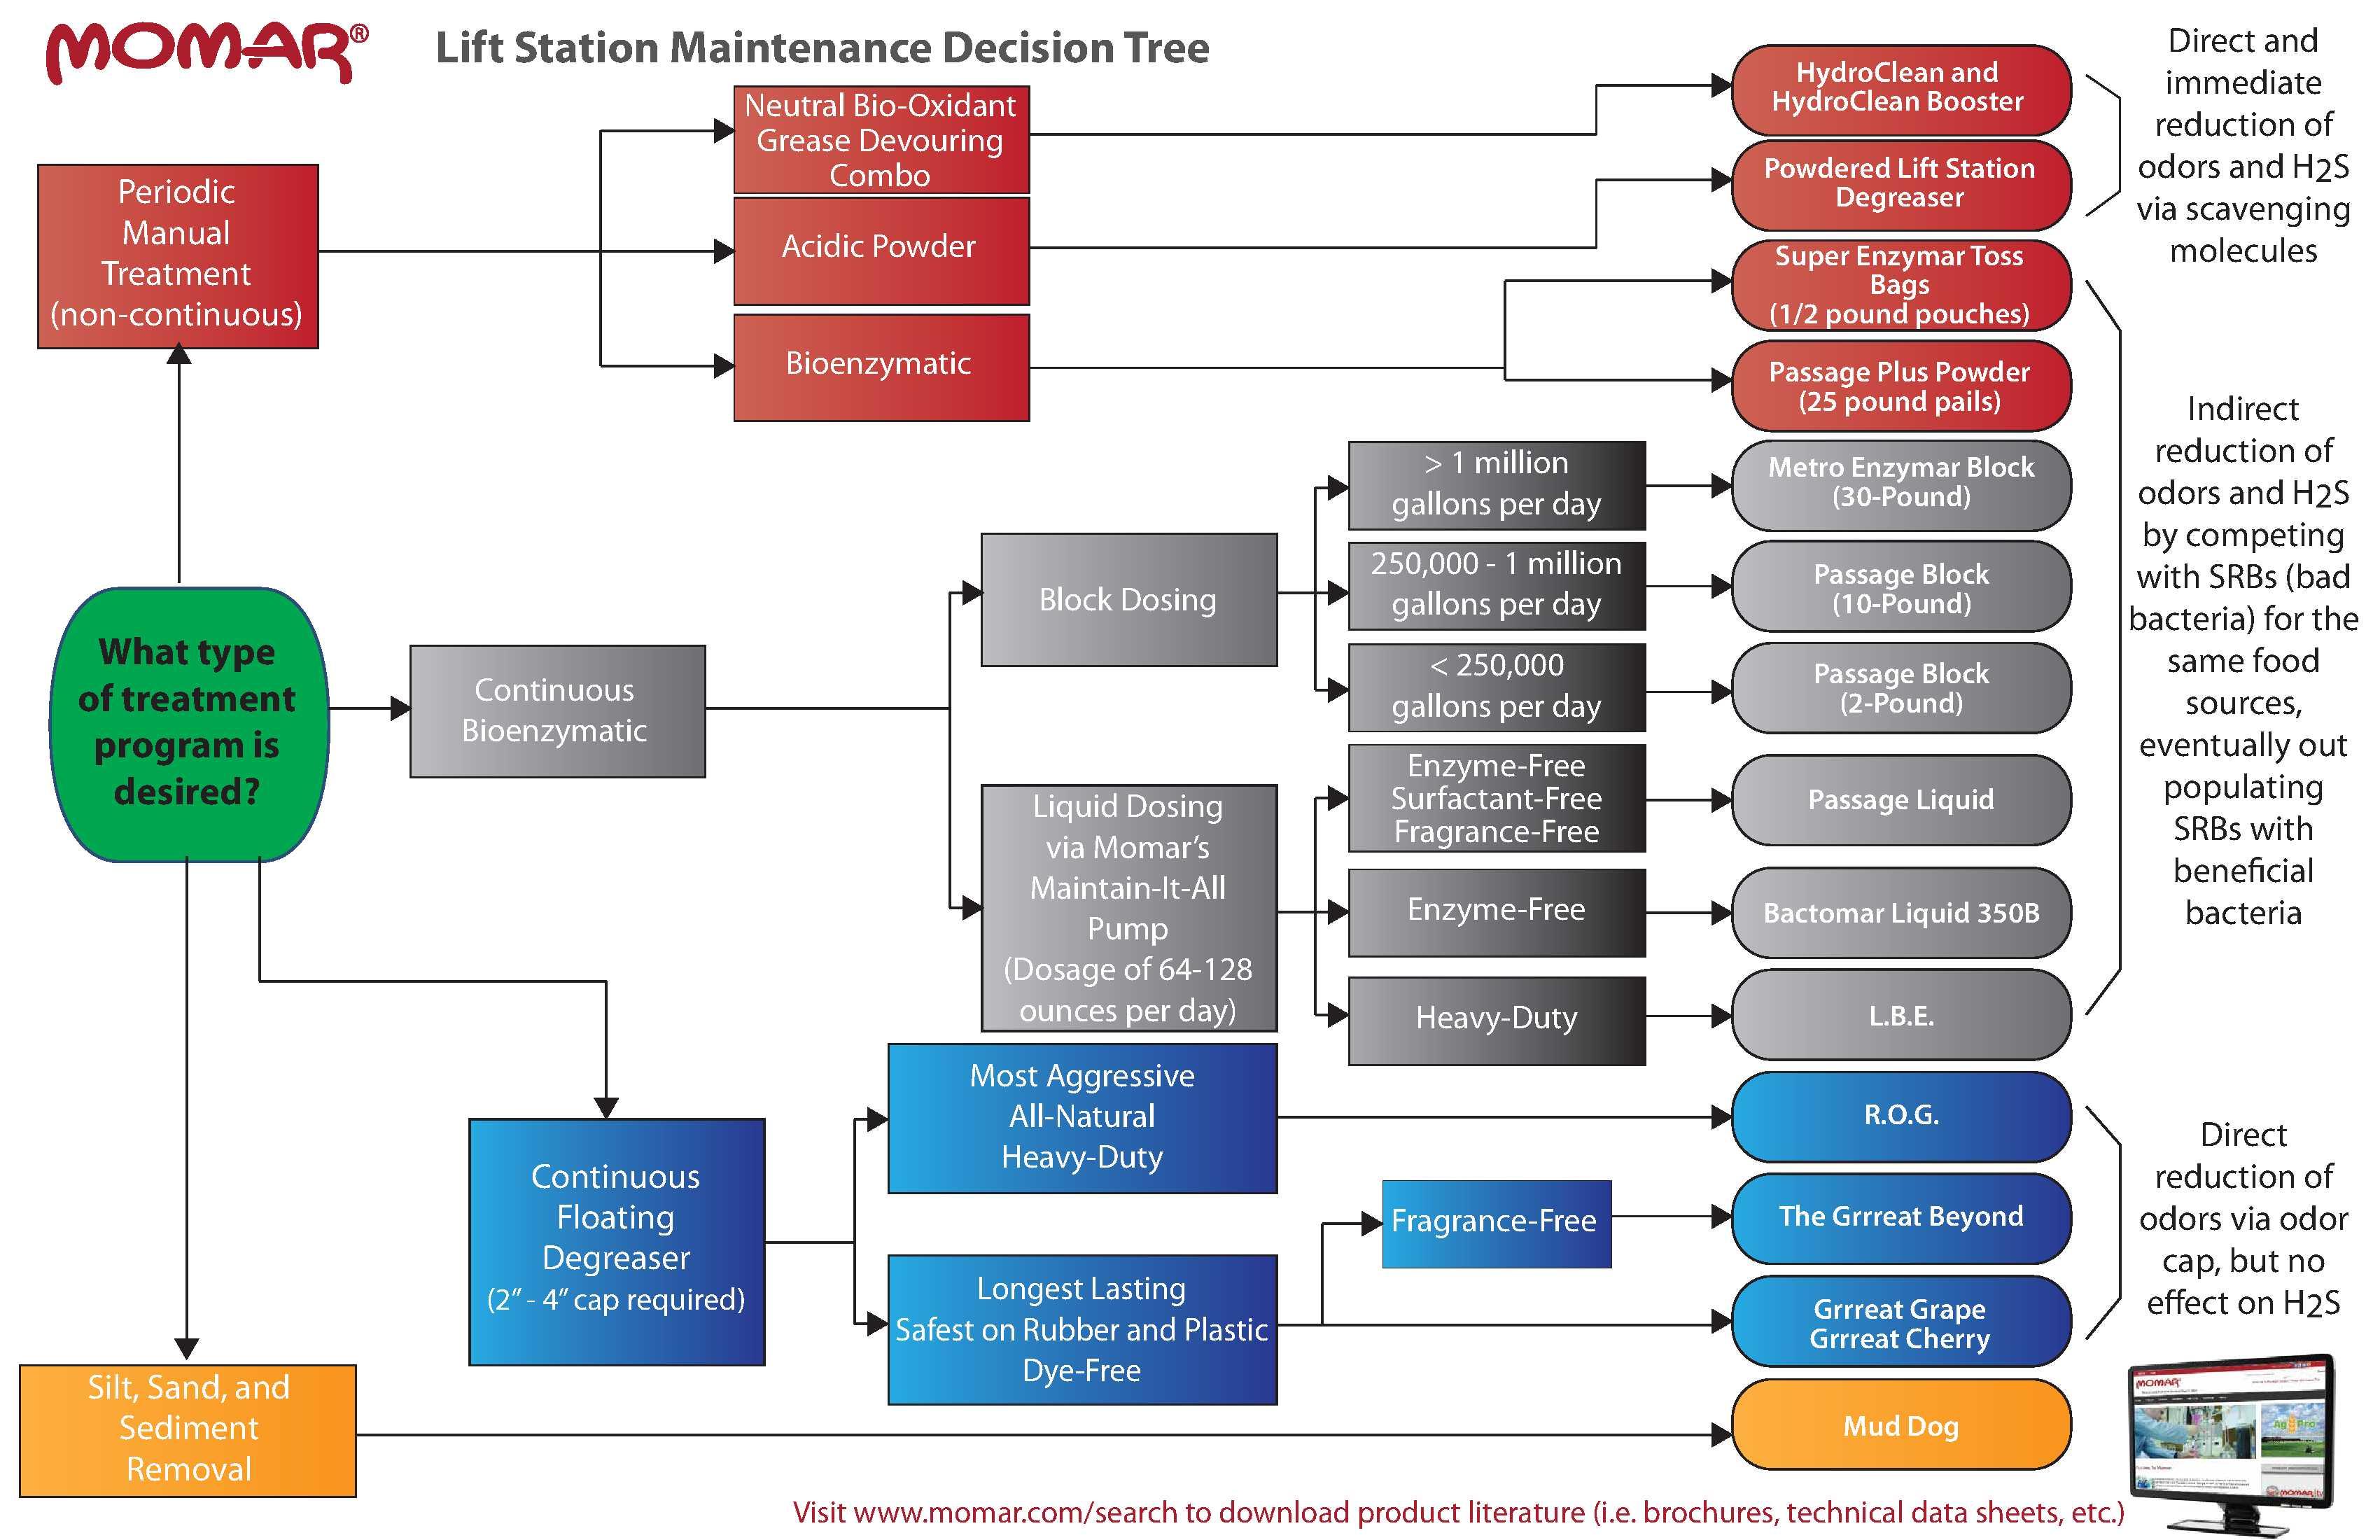 LIFT STATION MAINTENANCE DECISION TREE